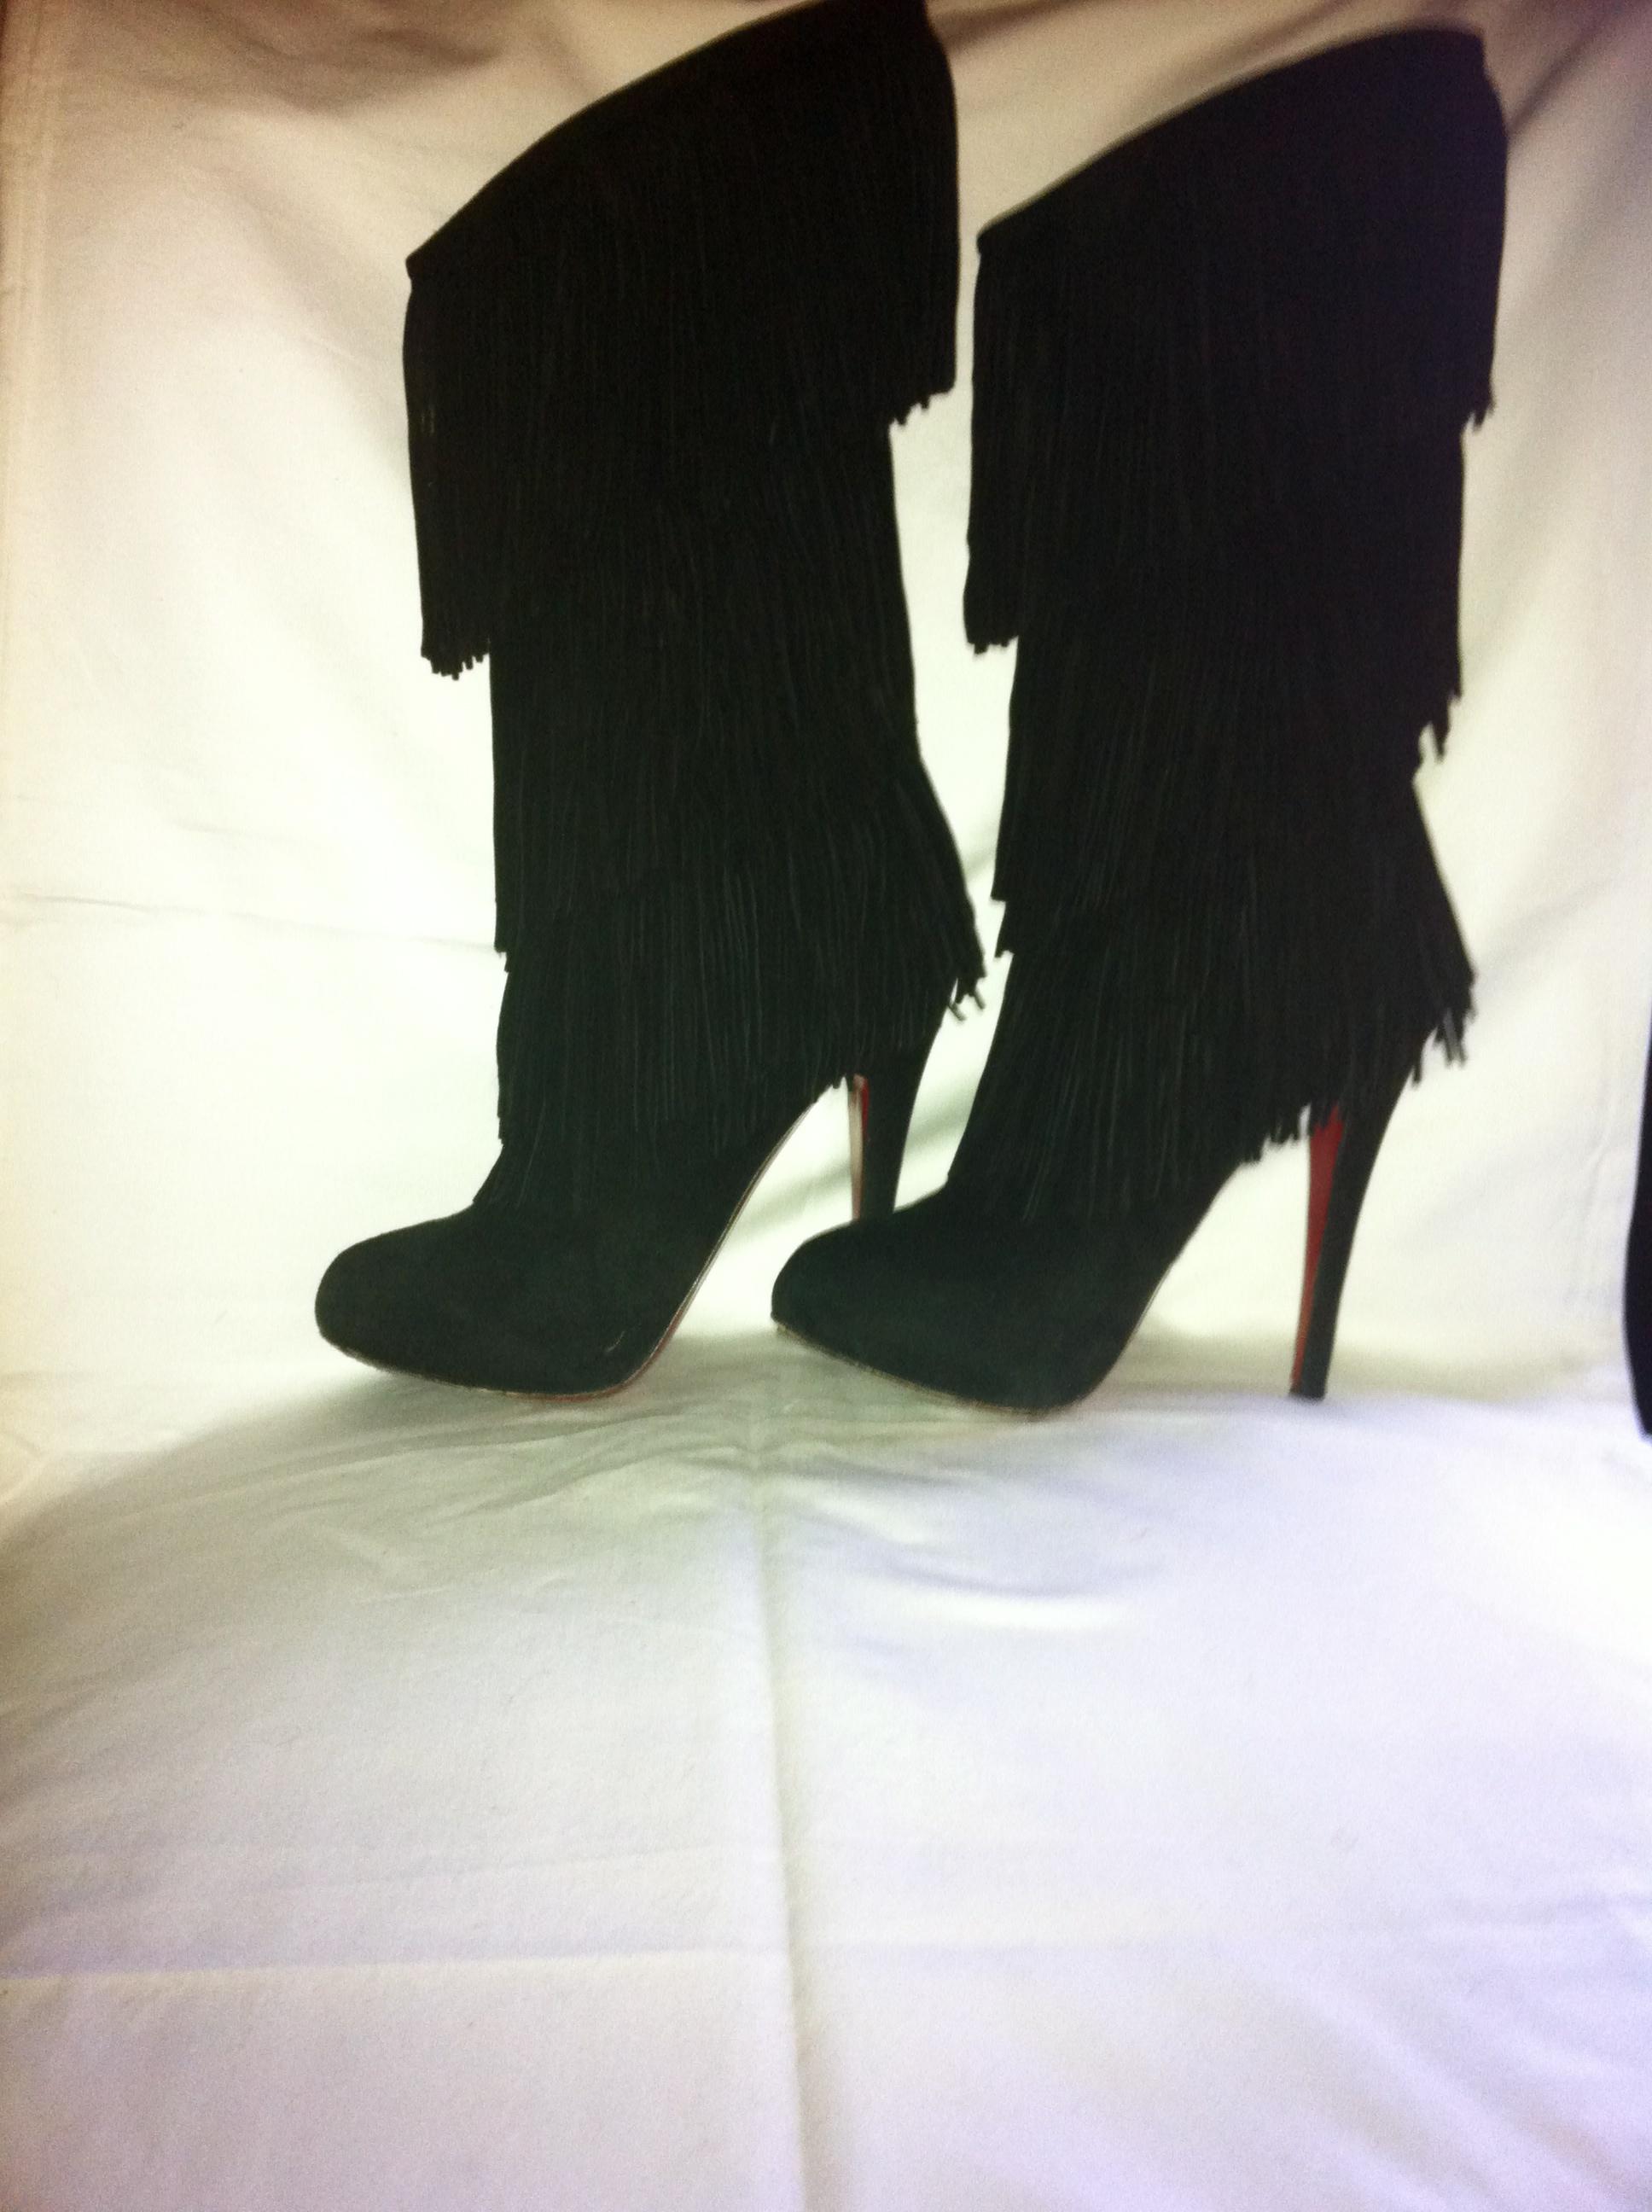 promo code 2cf42 12f1e CHRISTIAN LOUBOUTIN BLACK FRINGE SUEDE BOOT HEELS 36 1/2 from Shop Posh  Closet